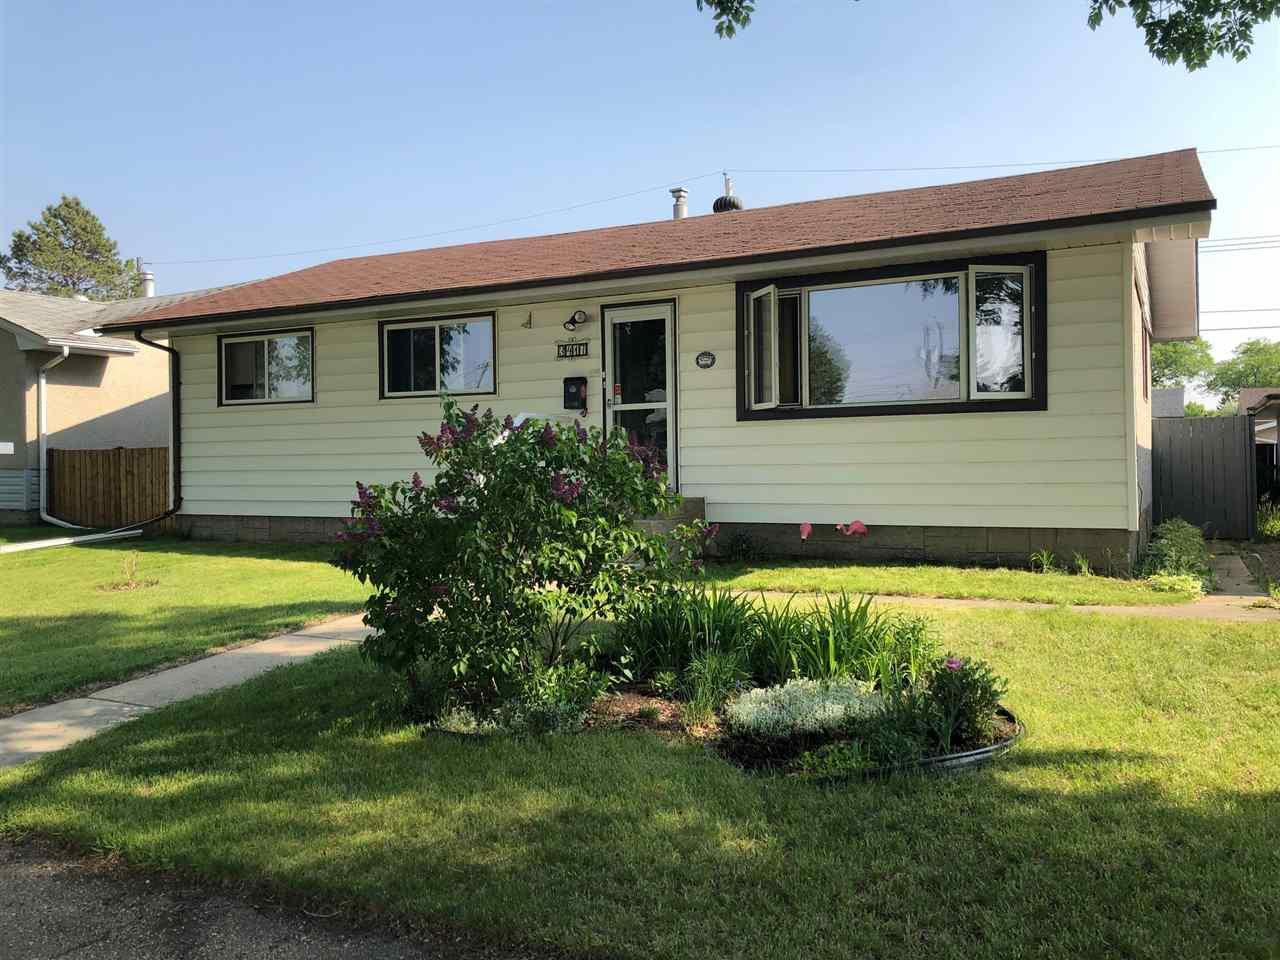 Main Photo: 3417 120A Avenue in Edmonton: Zone 23 House for sale : MLS®# E4162749